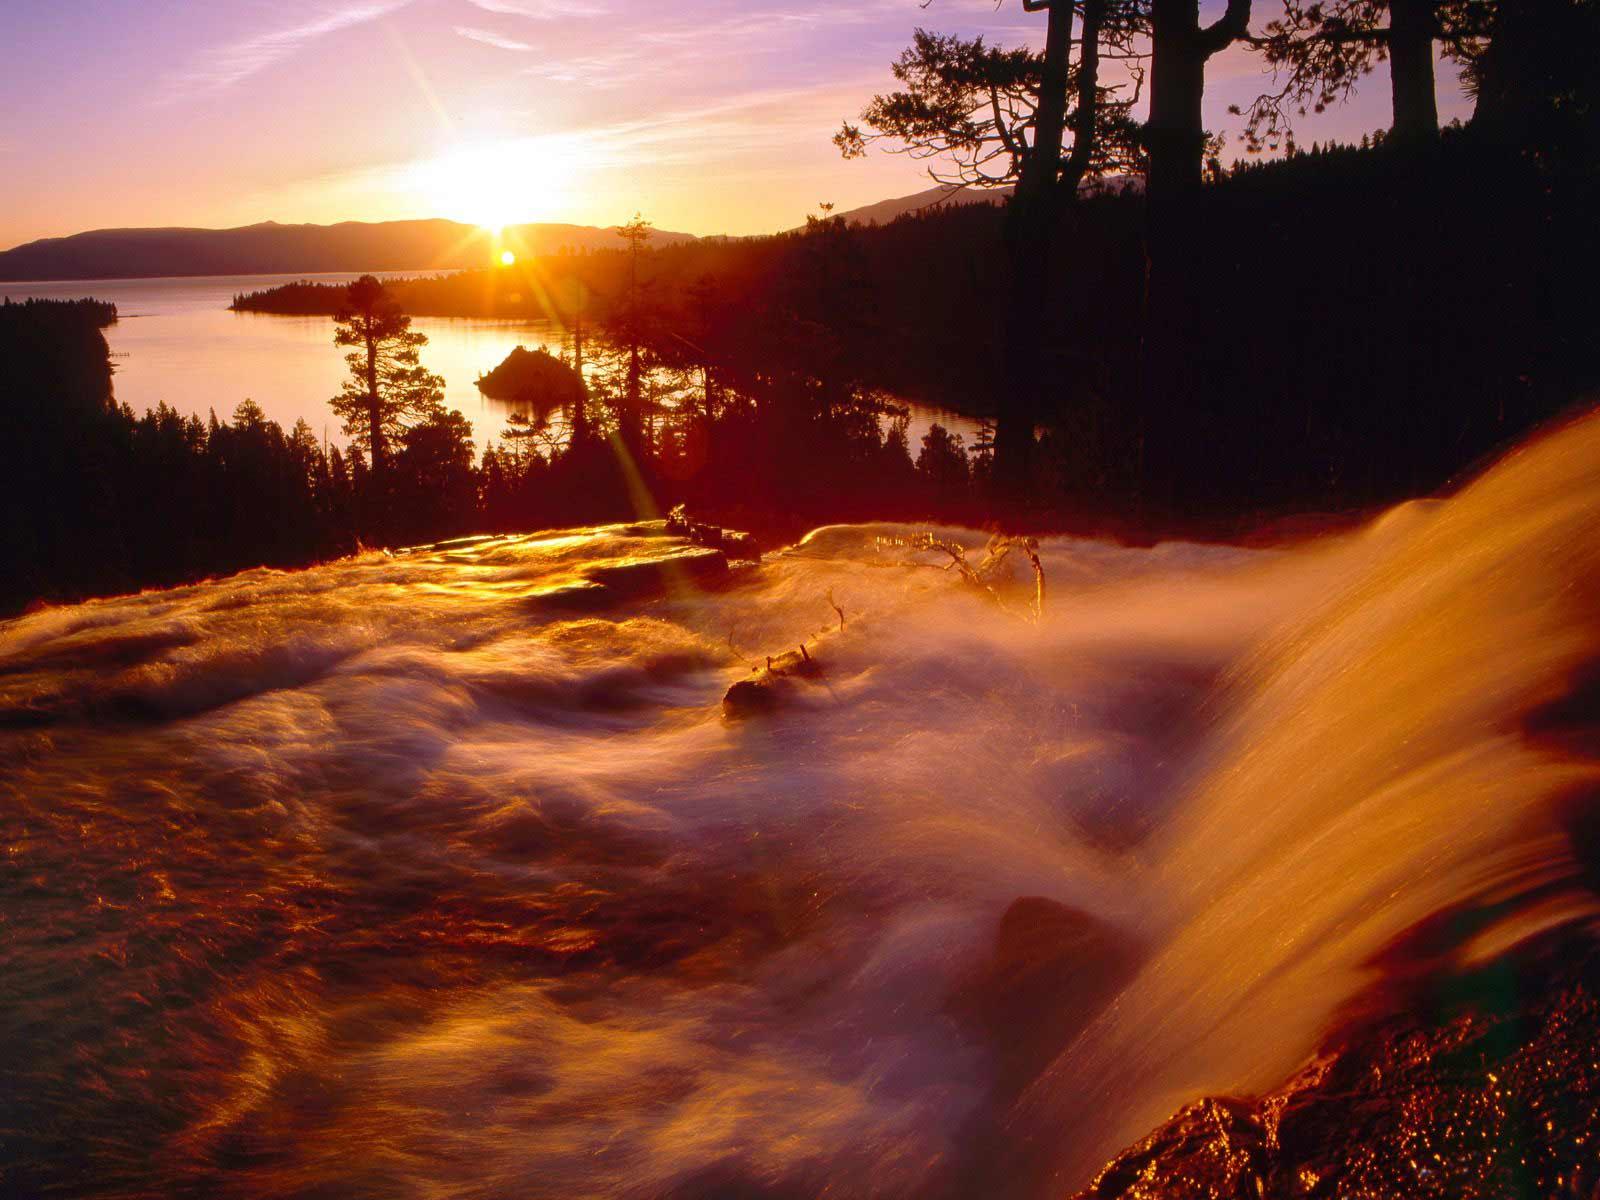 sunrise wallpaper waterfall